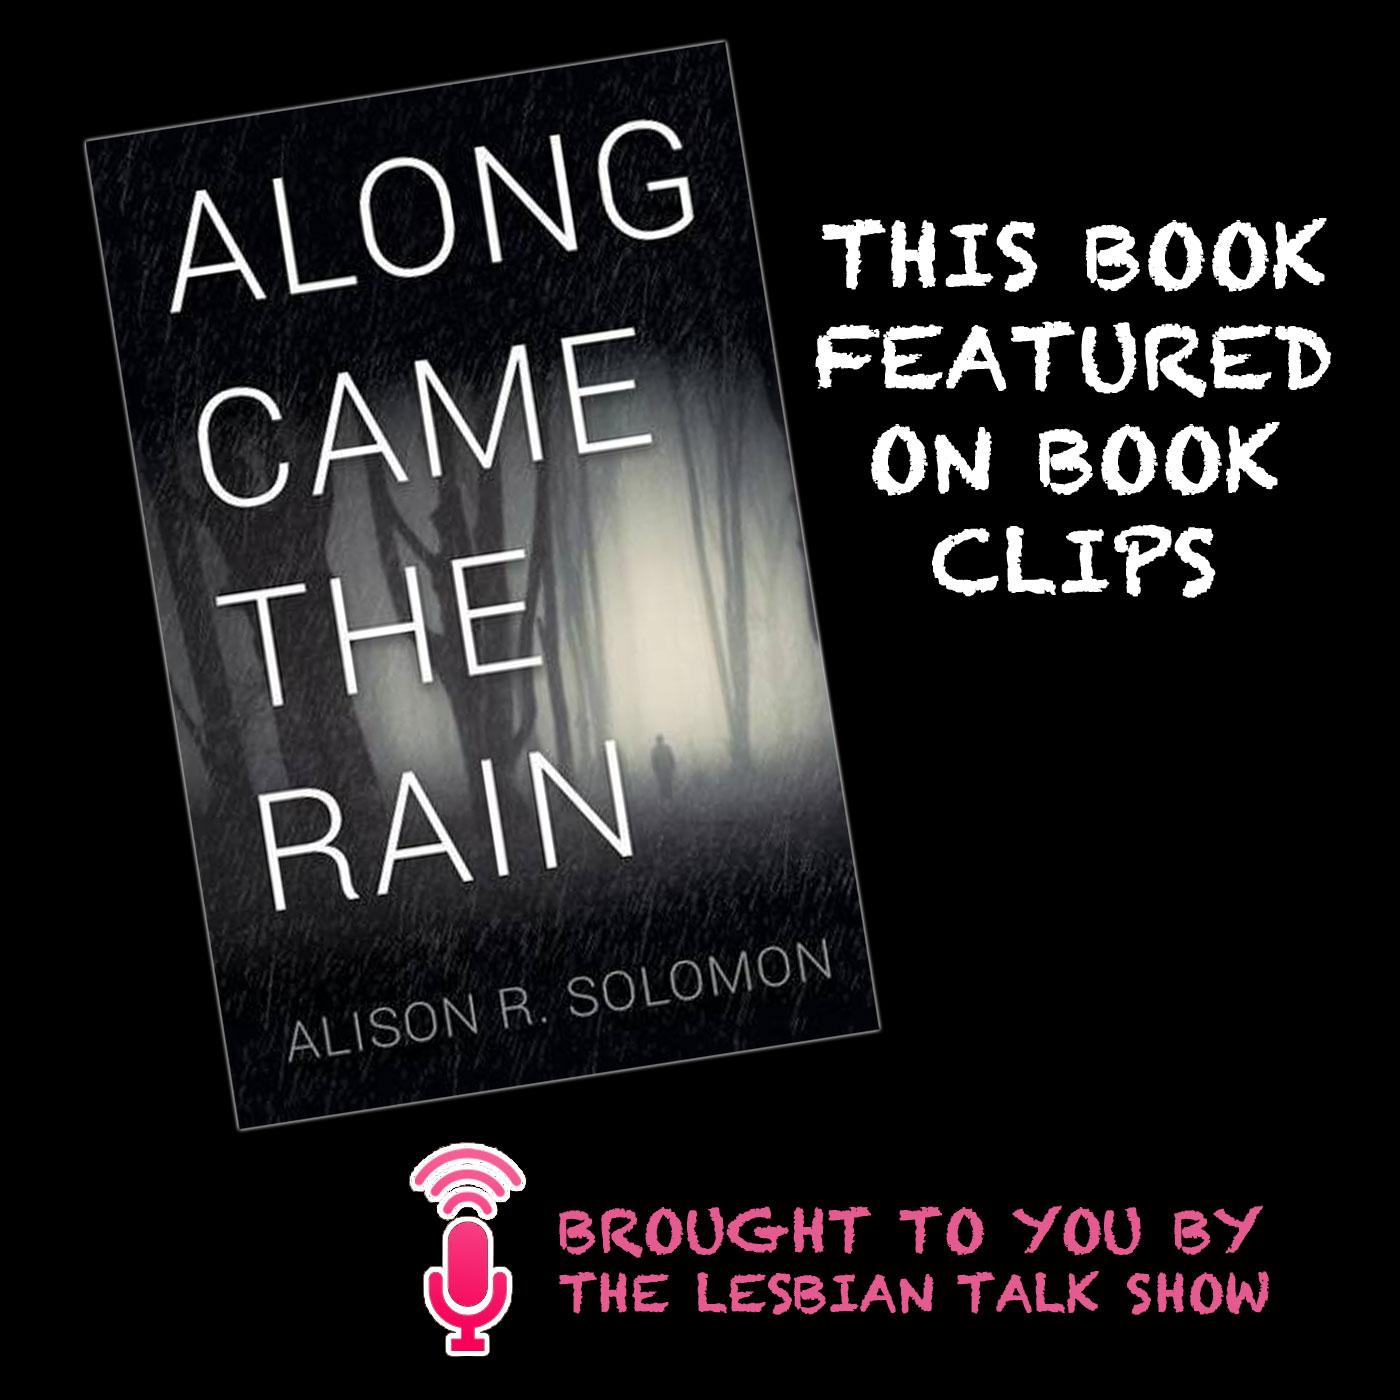 Book Clips: Along Came The Rain by Alison R Solomon